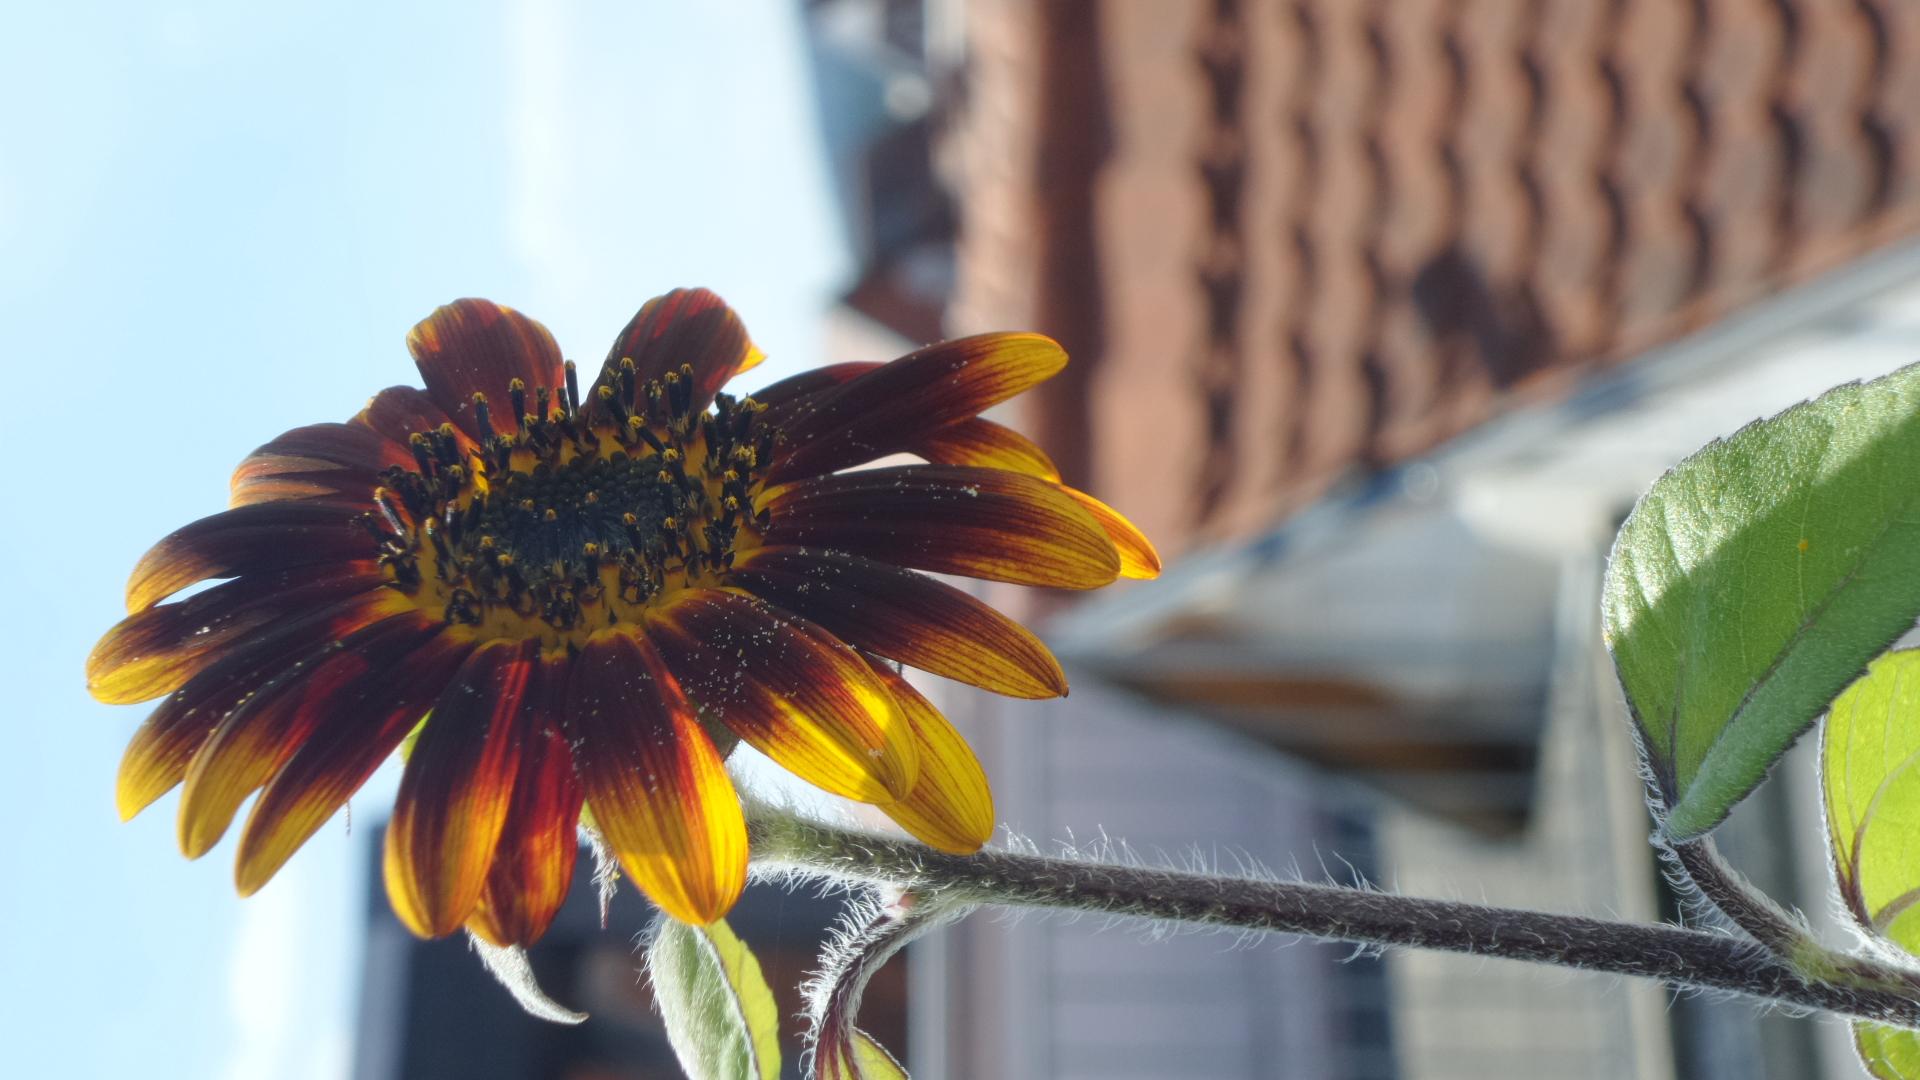 Flower near